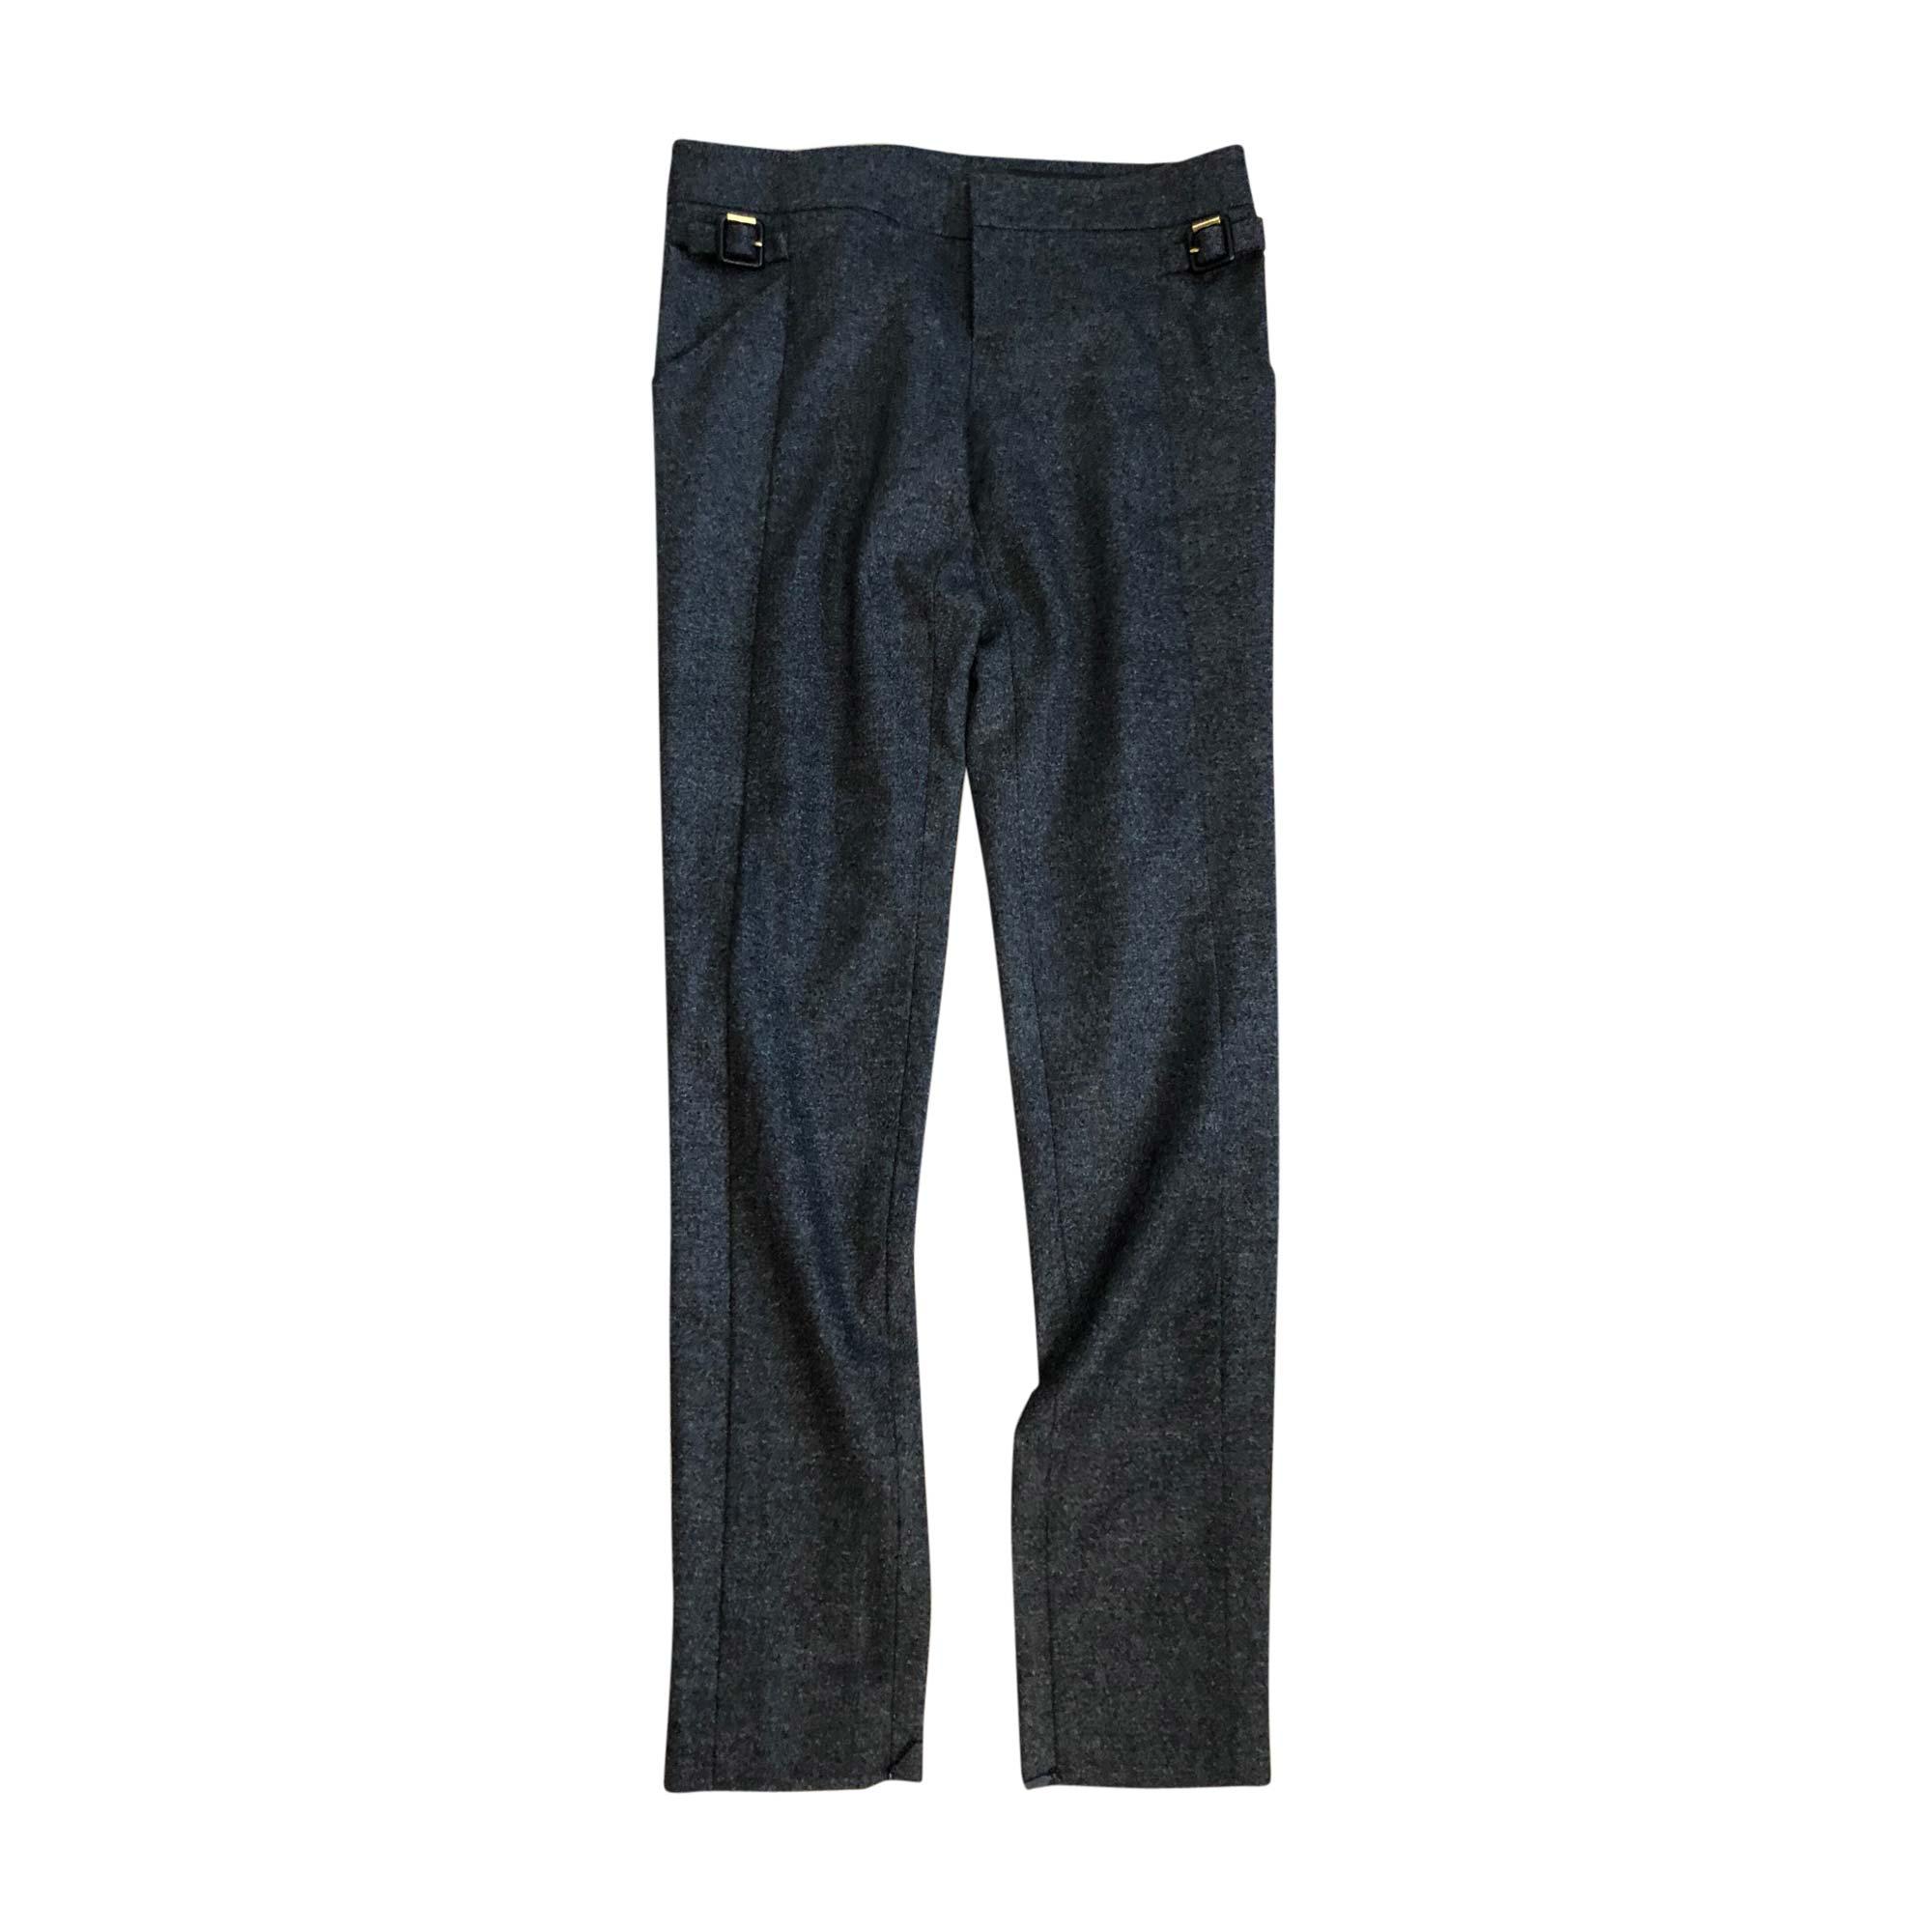 Straight Leg Pants GUCCI Gray, charcoal